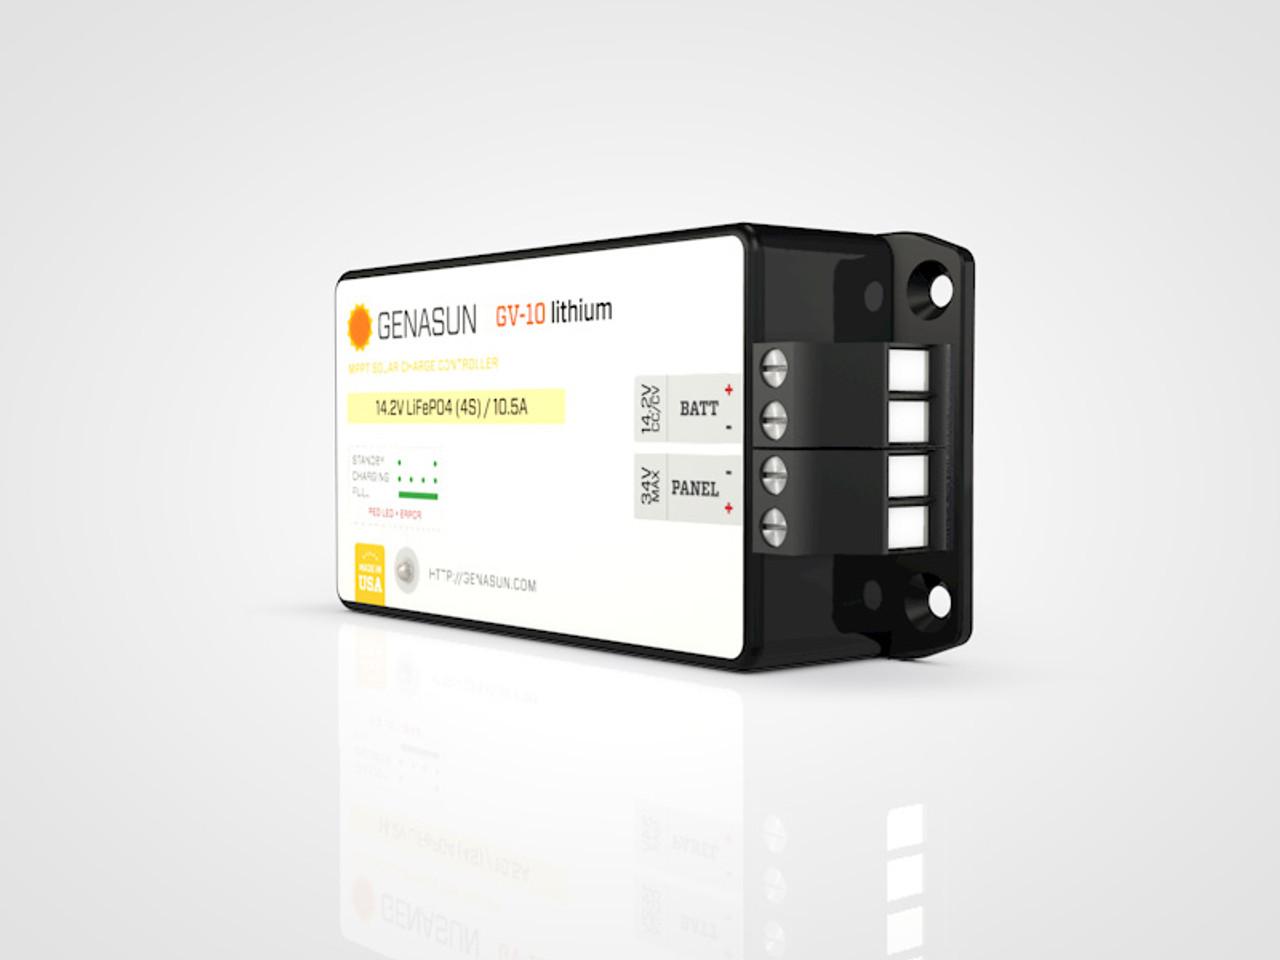 GV-10 | 140W 10.5A Genasun MPPT Solar Charge Controller - Li - Right2